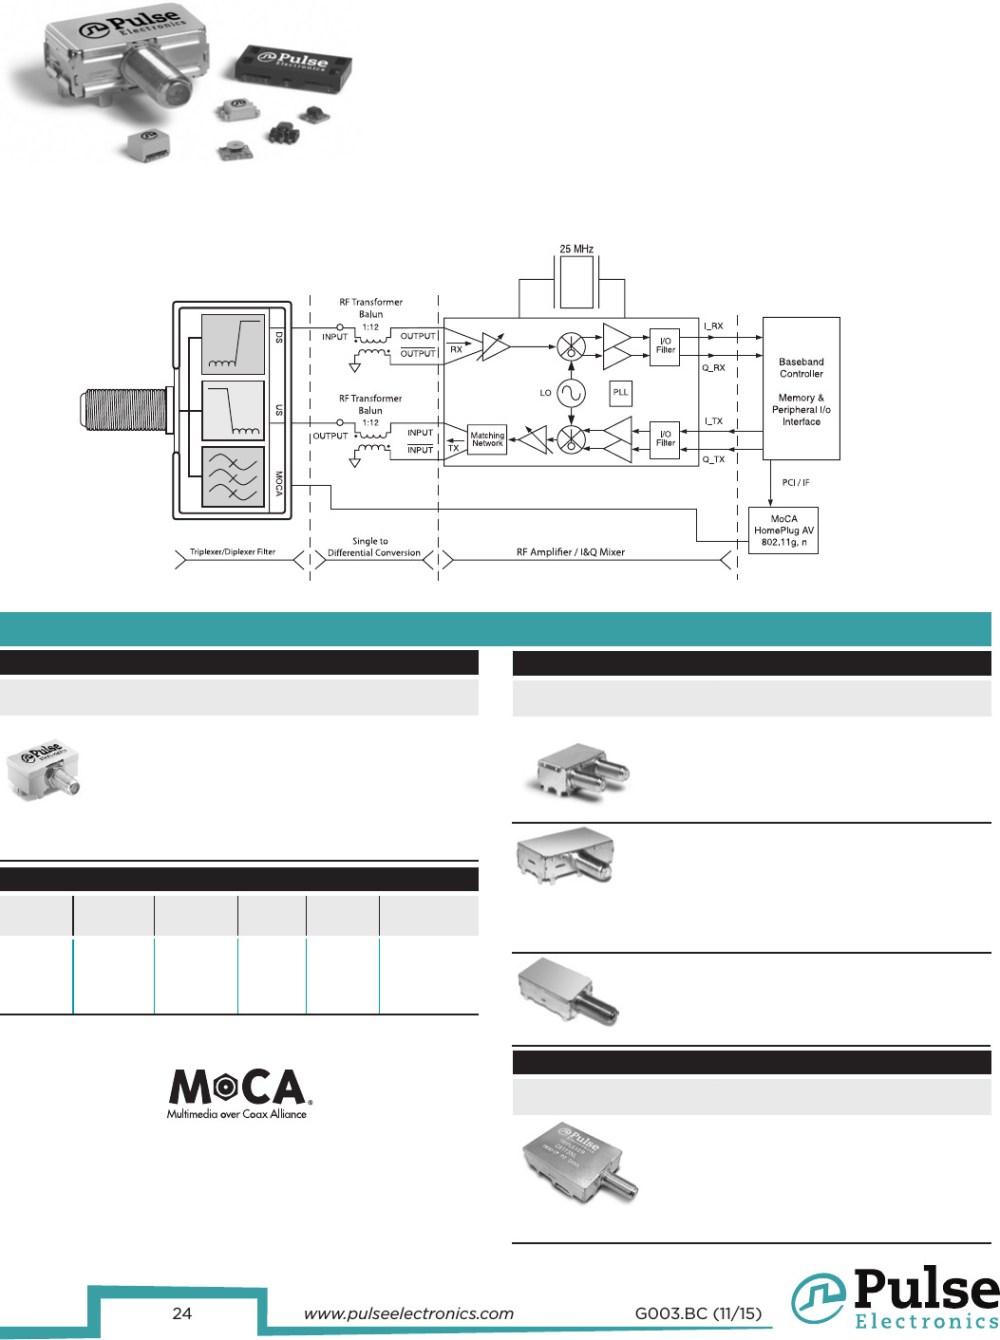 medium resolution of 24 www pulseelectronics com g003 bc 11 15